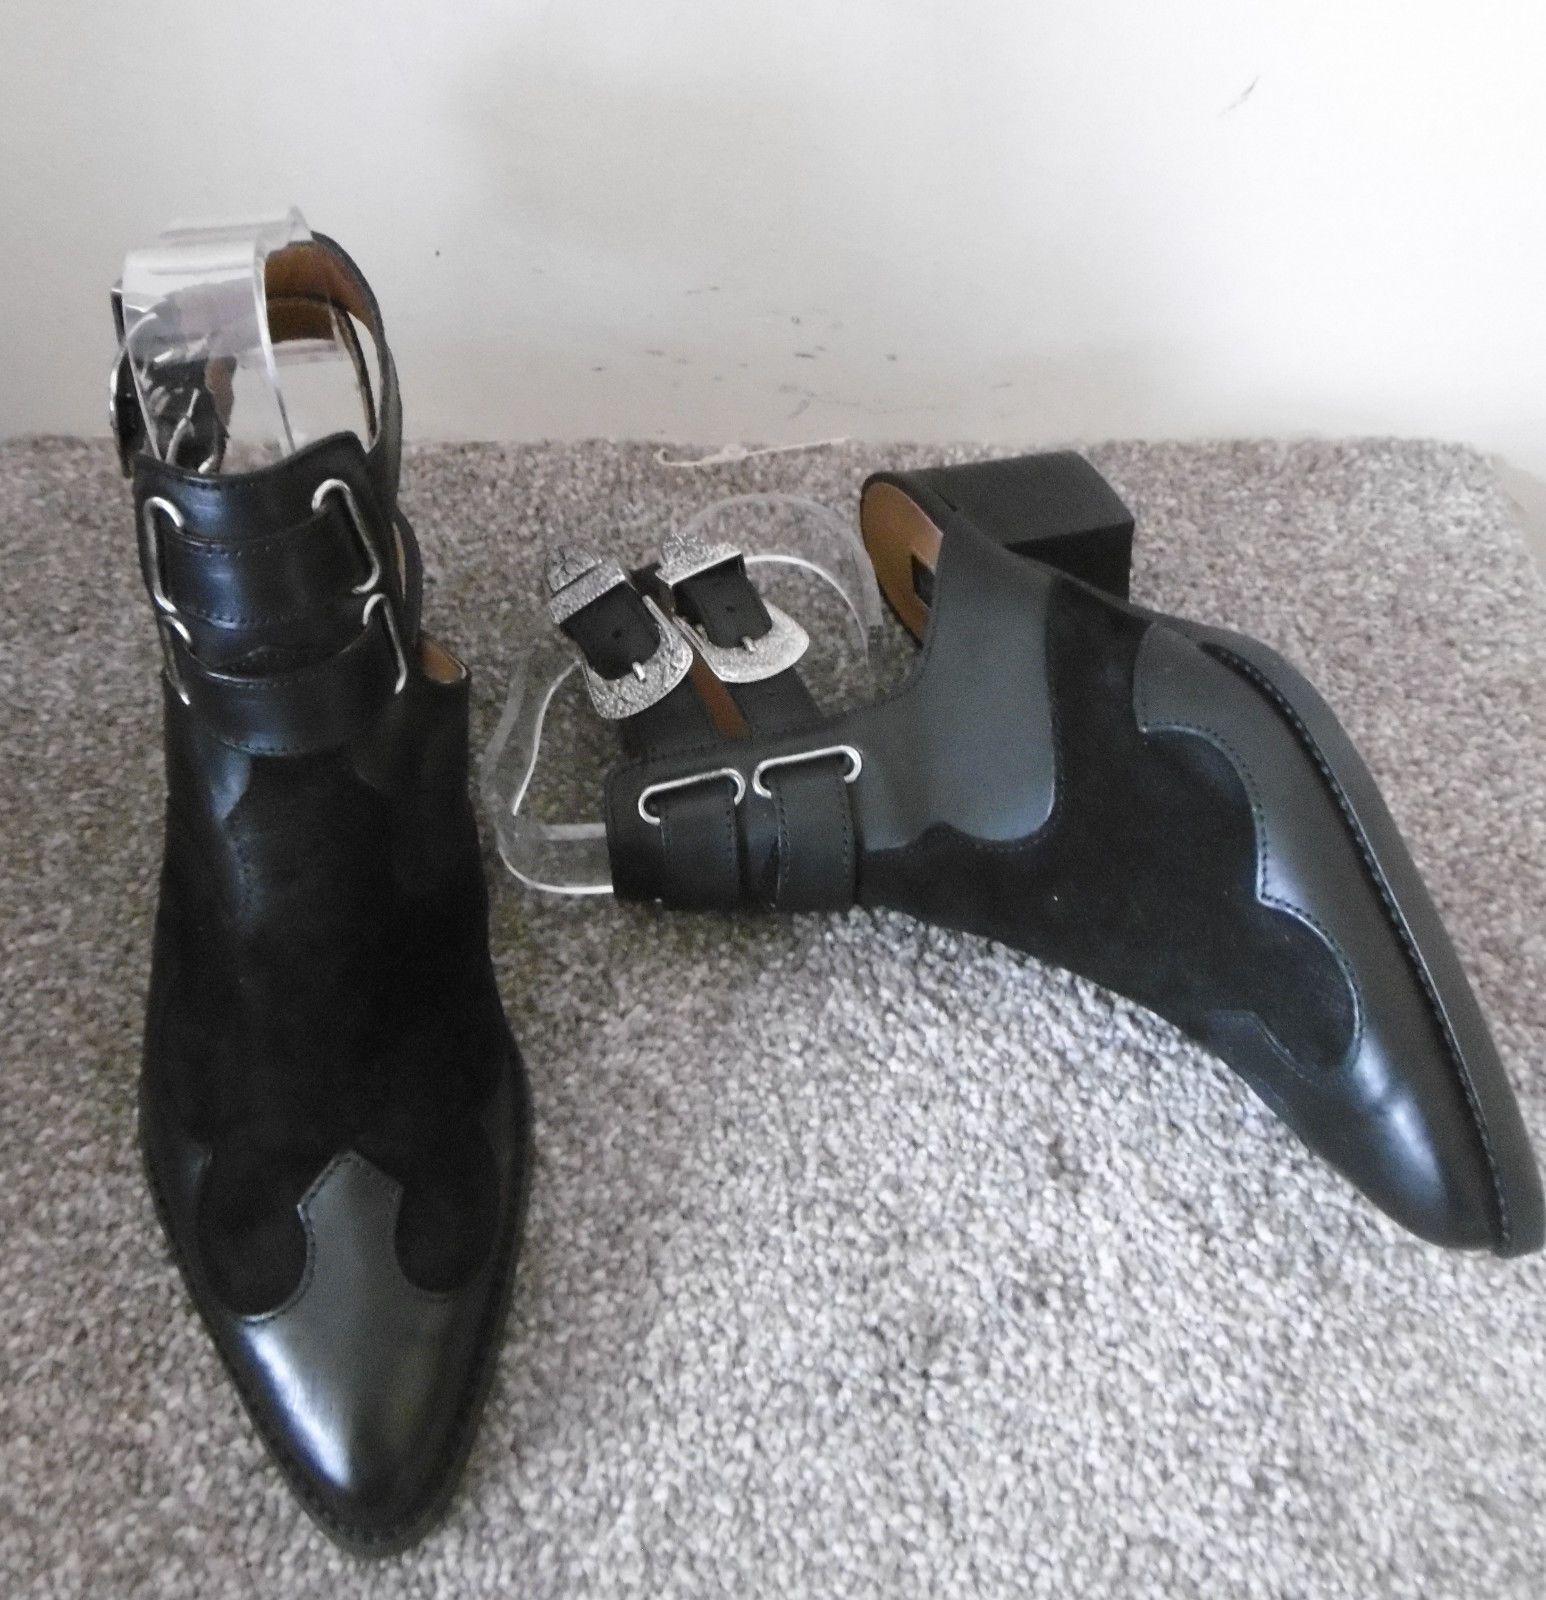 Topshop Black AUSTIN Western Buckle Heeled Boots Size UK 5 EU 38 In Store 69 https://t.co/fyCuujgshg https://t.co/fbgCospqv5